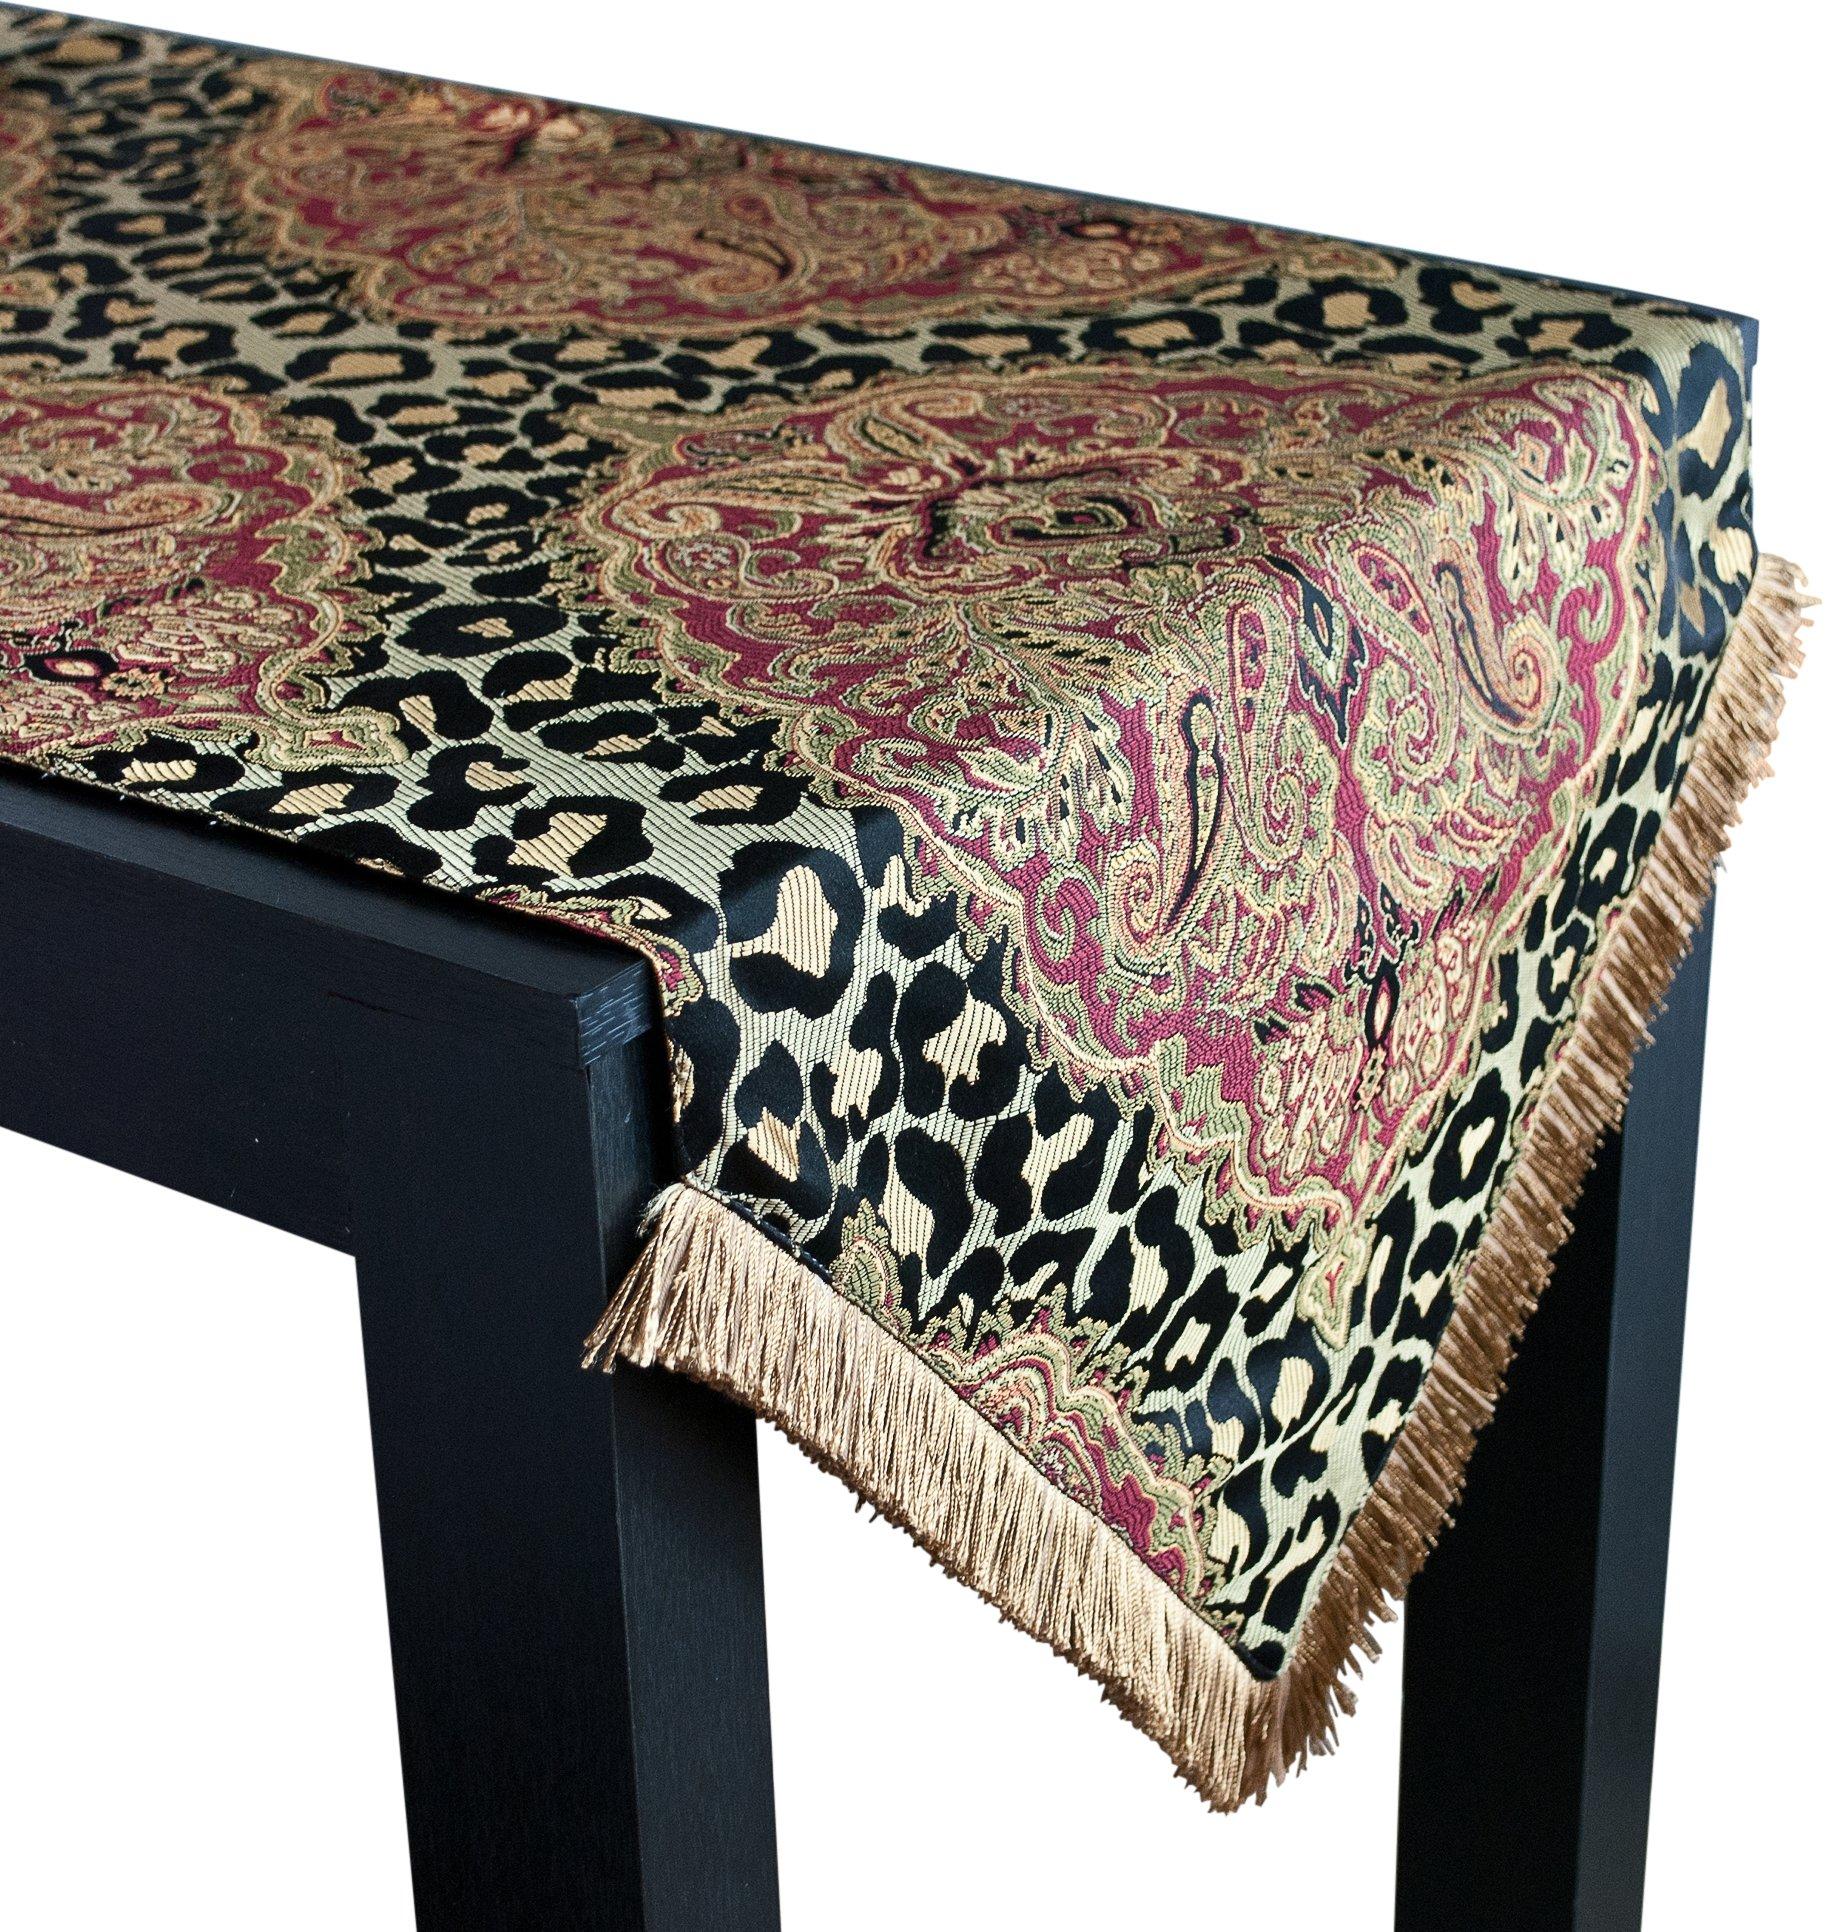 Sherry Kline Tangiers Luxury Table Runner, 18'' X 108'', Black/Multicolor